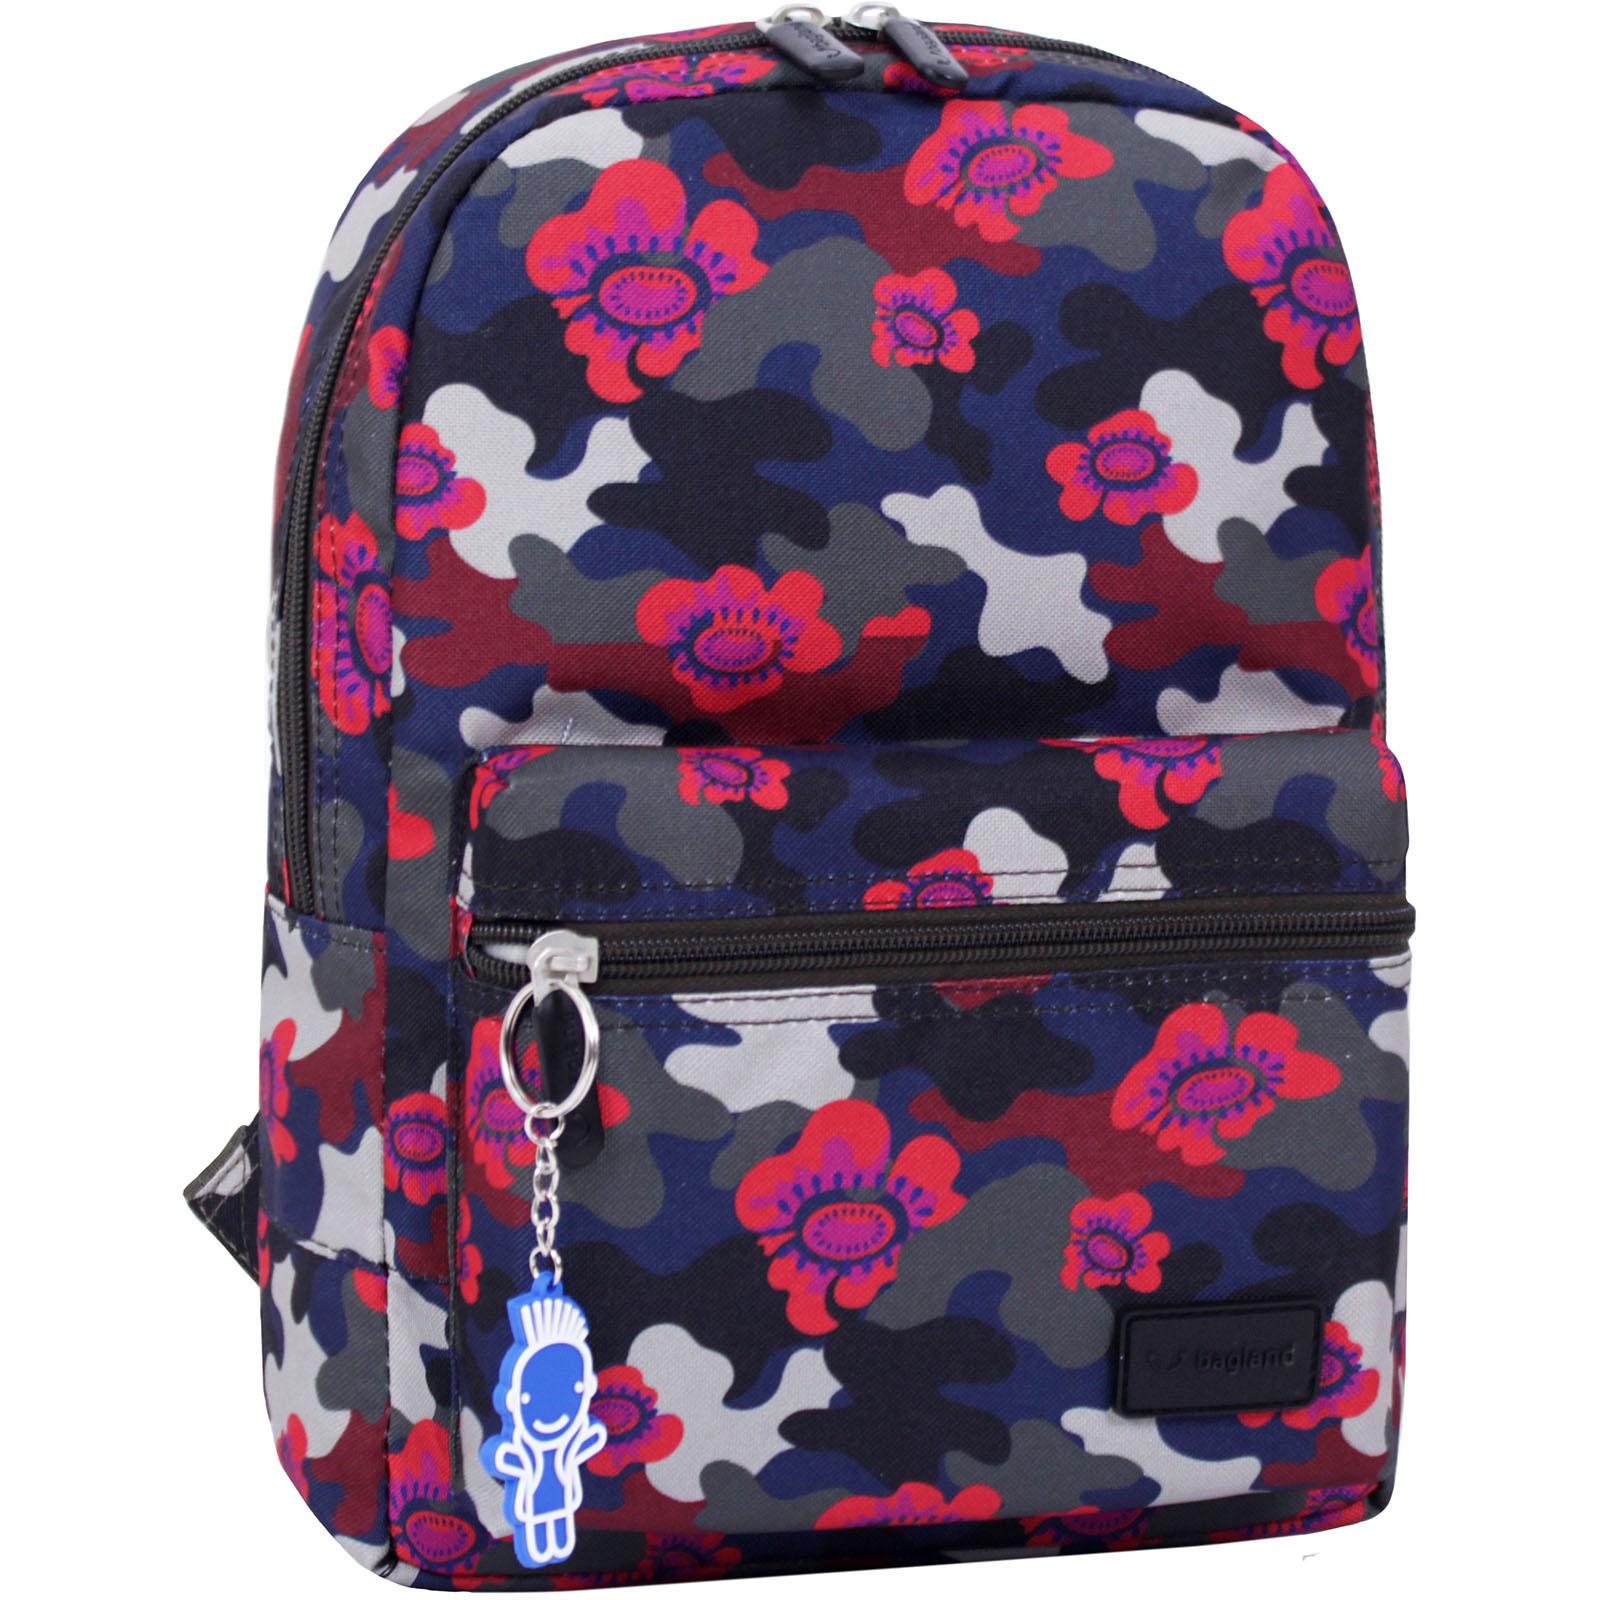 Молодежные рюкзаки Рюкзак Bagland Молодежный mini 8 л. сублимация (459) (00508664) IMG_3664_суб.459_.JPG